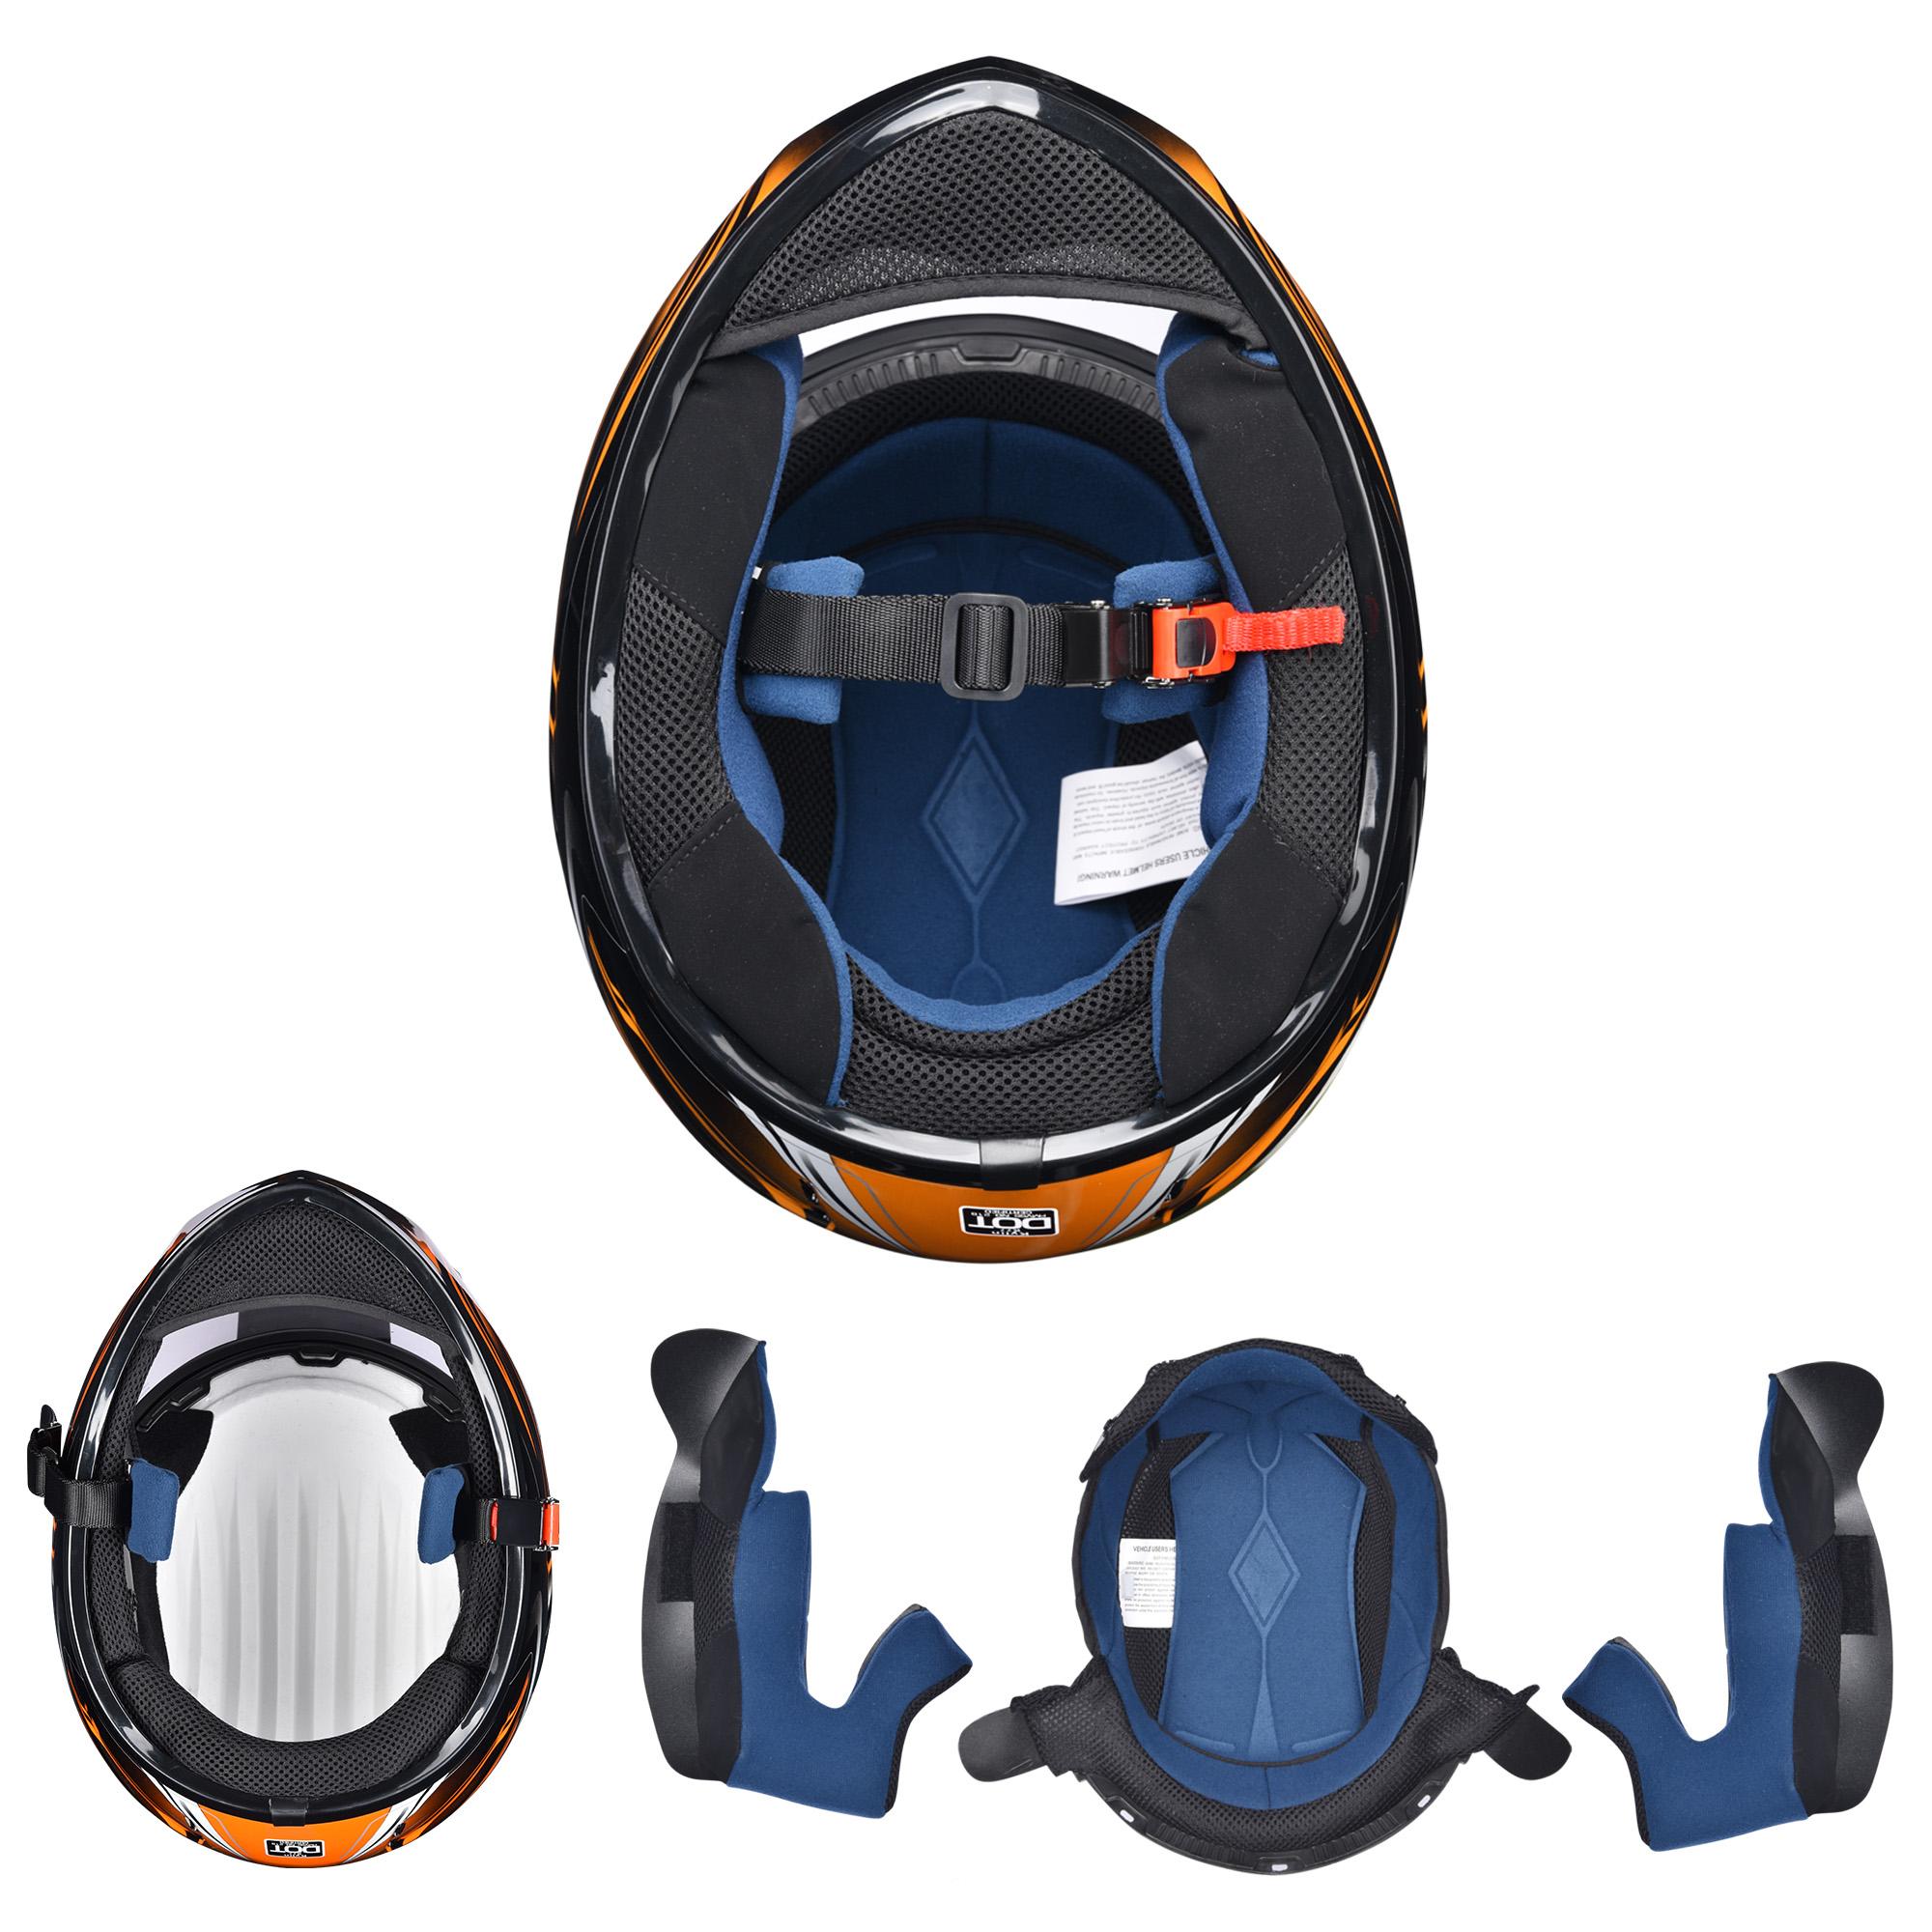 miniature 151 - AHR K12 Full Face Motorcycle Helmet DOT Air Vents Clear Visor Racing S M L XL